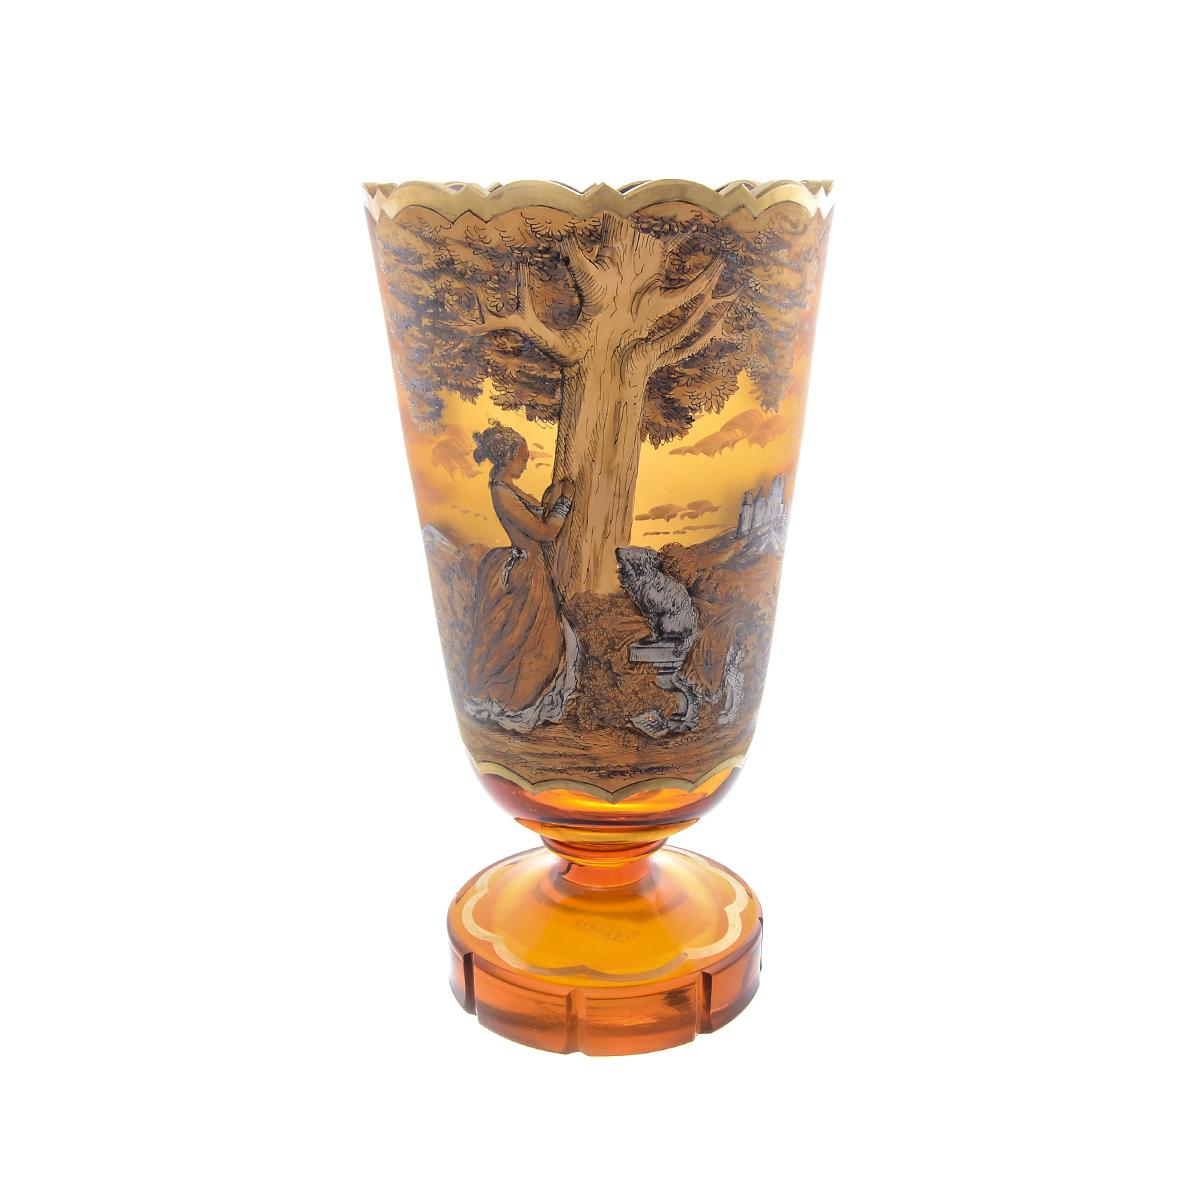 Ваза 27 см для цветов из стекла янтарного цвета от Egermann